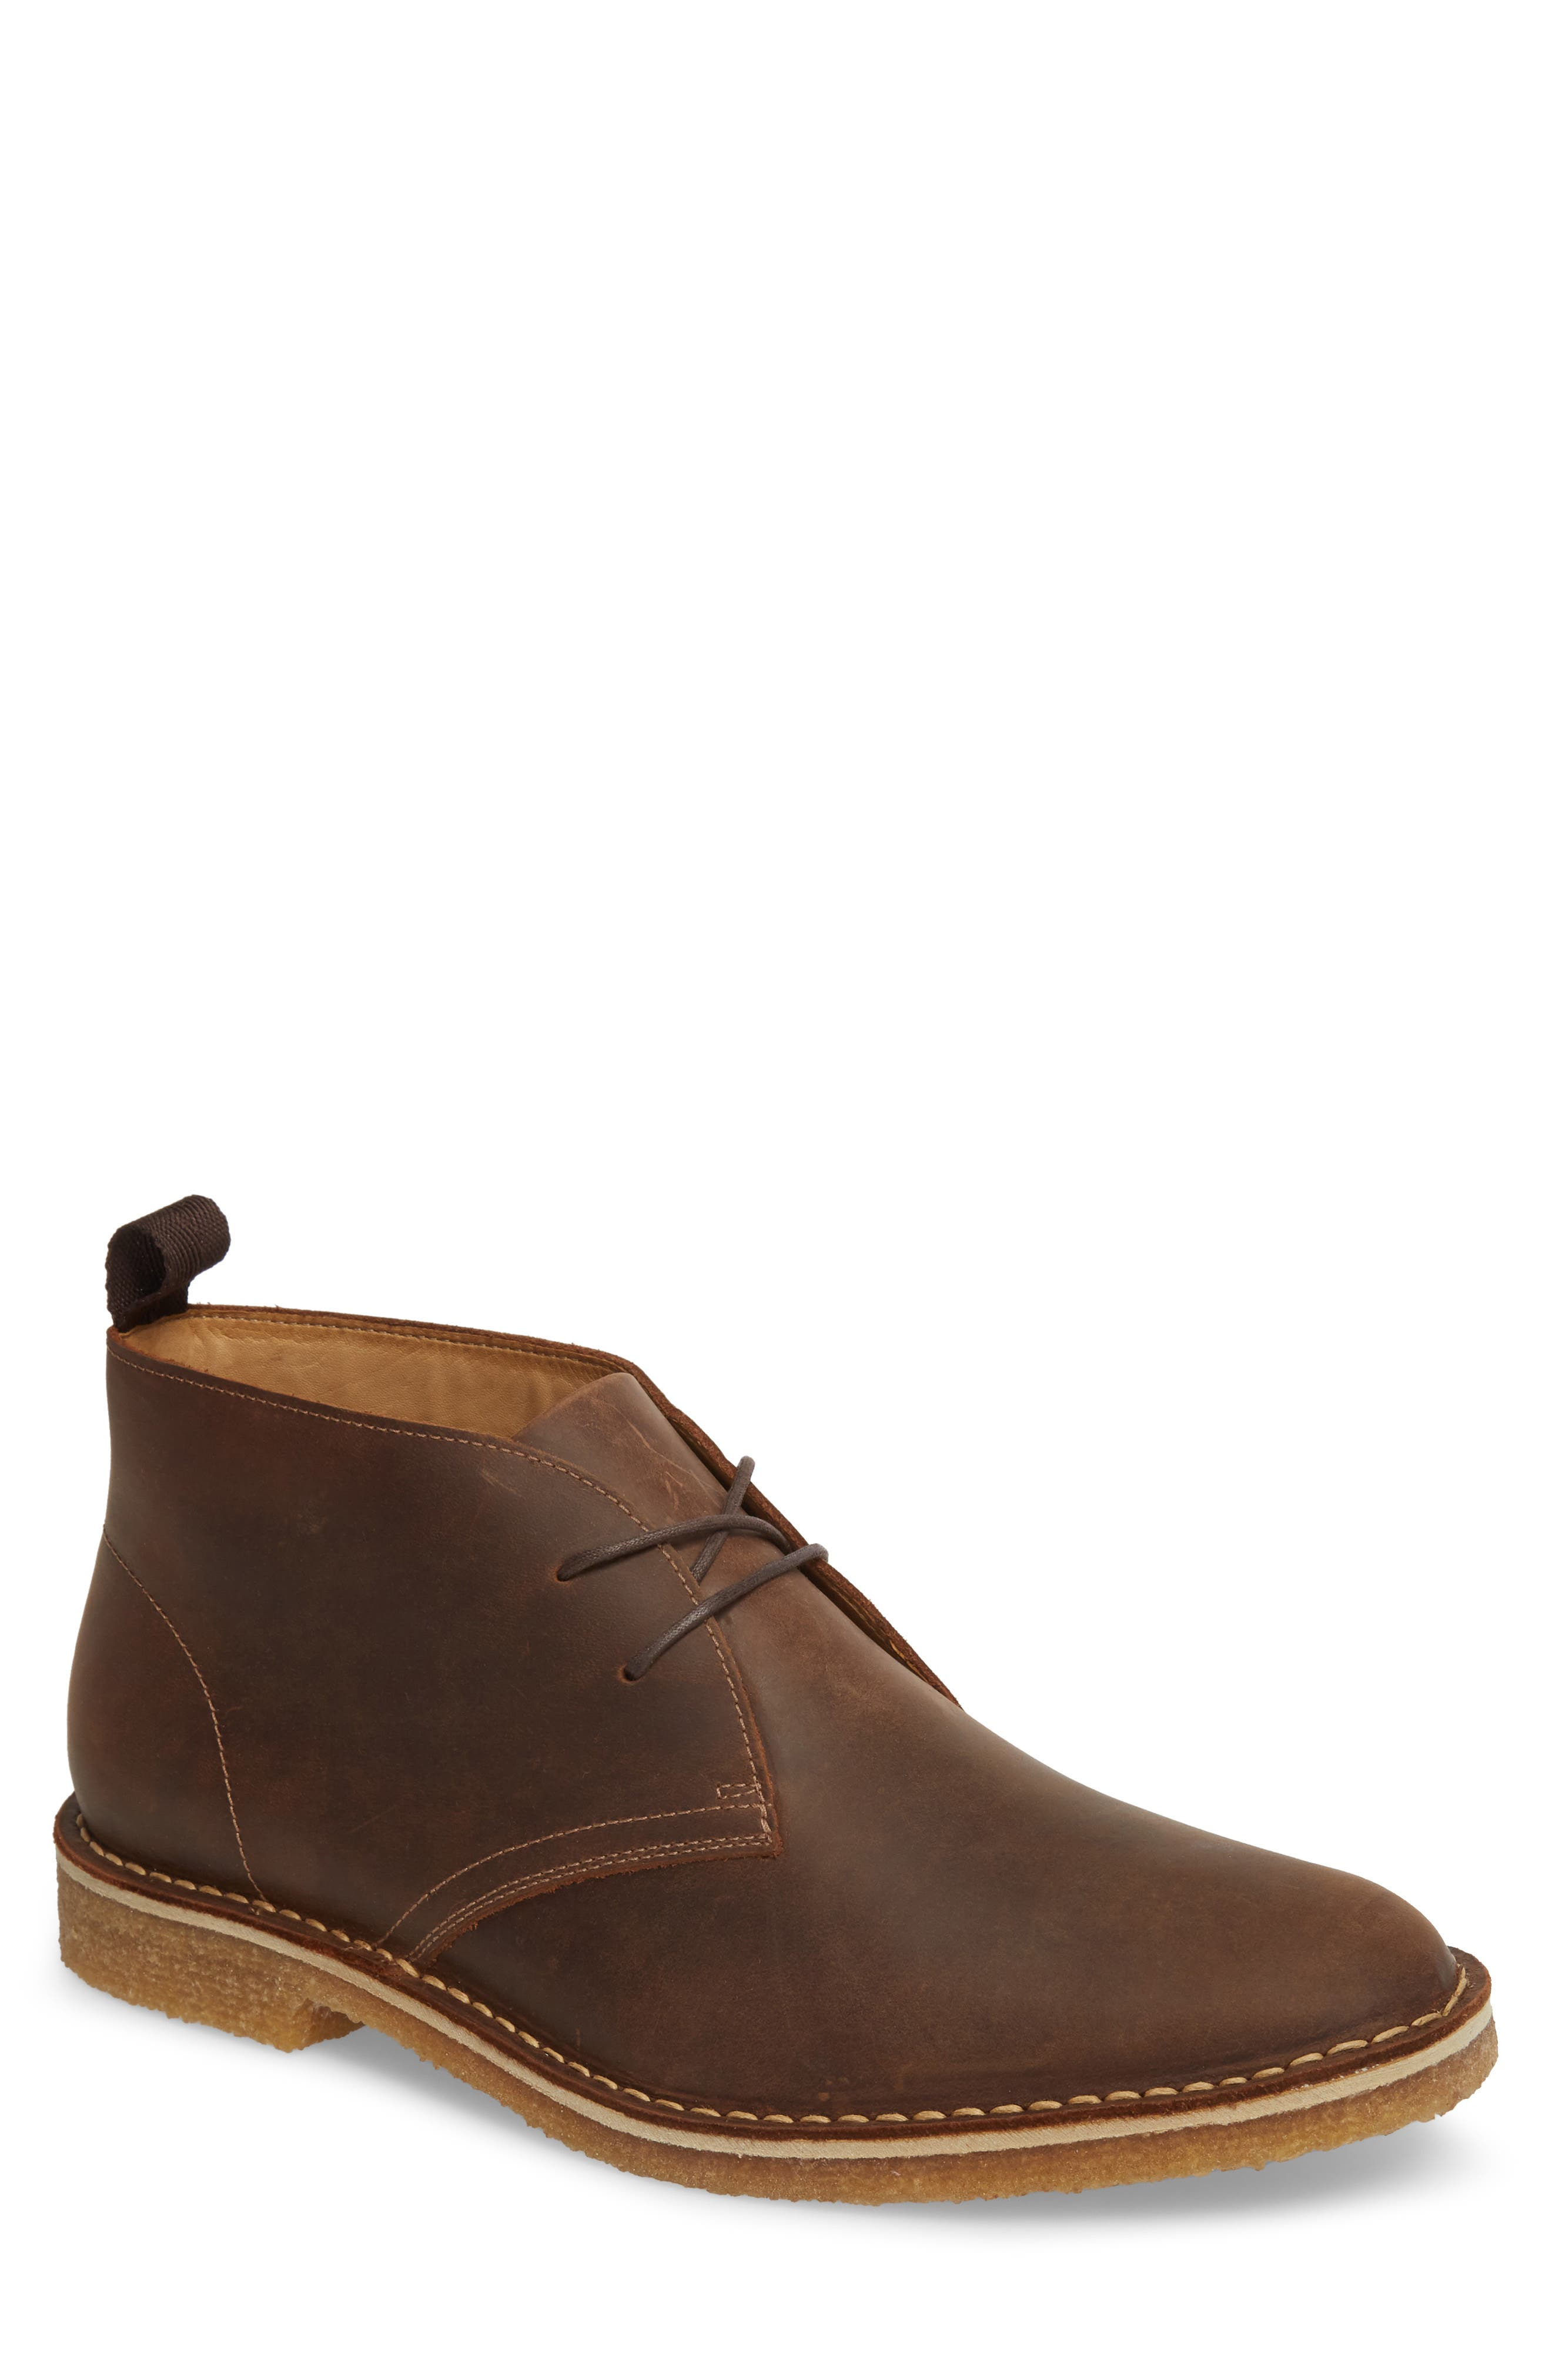 Hudson Chukka Boot,                         Main,                         color, BROWN LEATHER